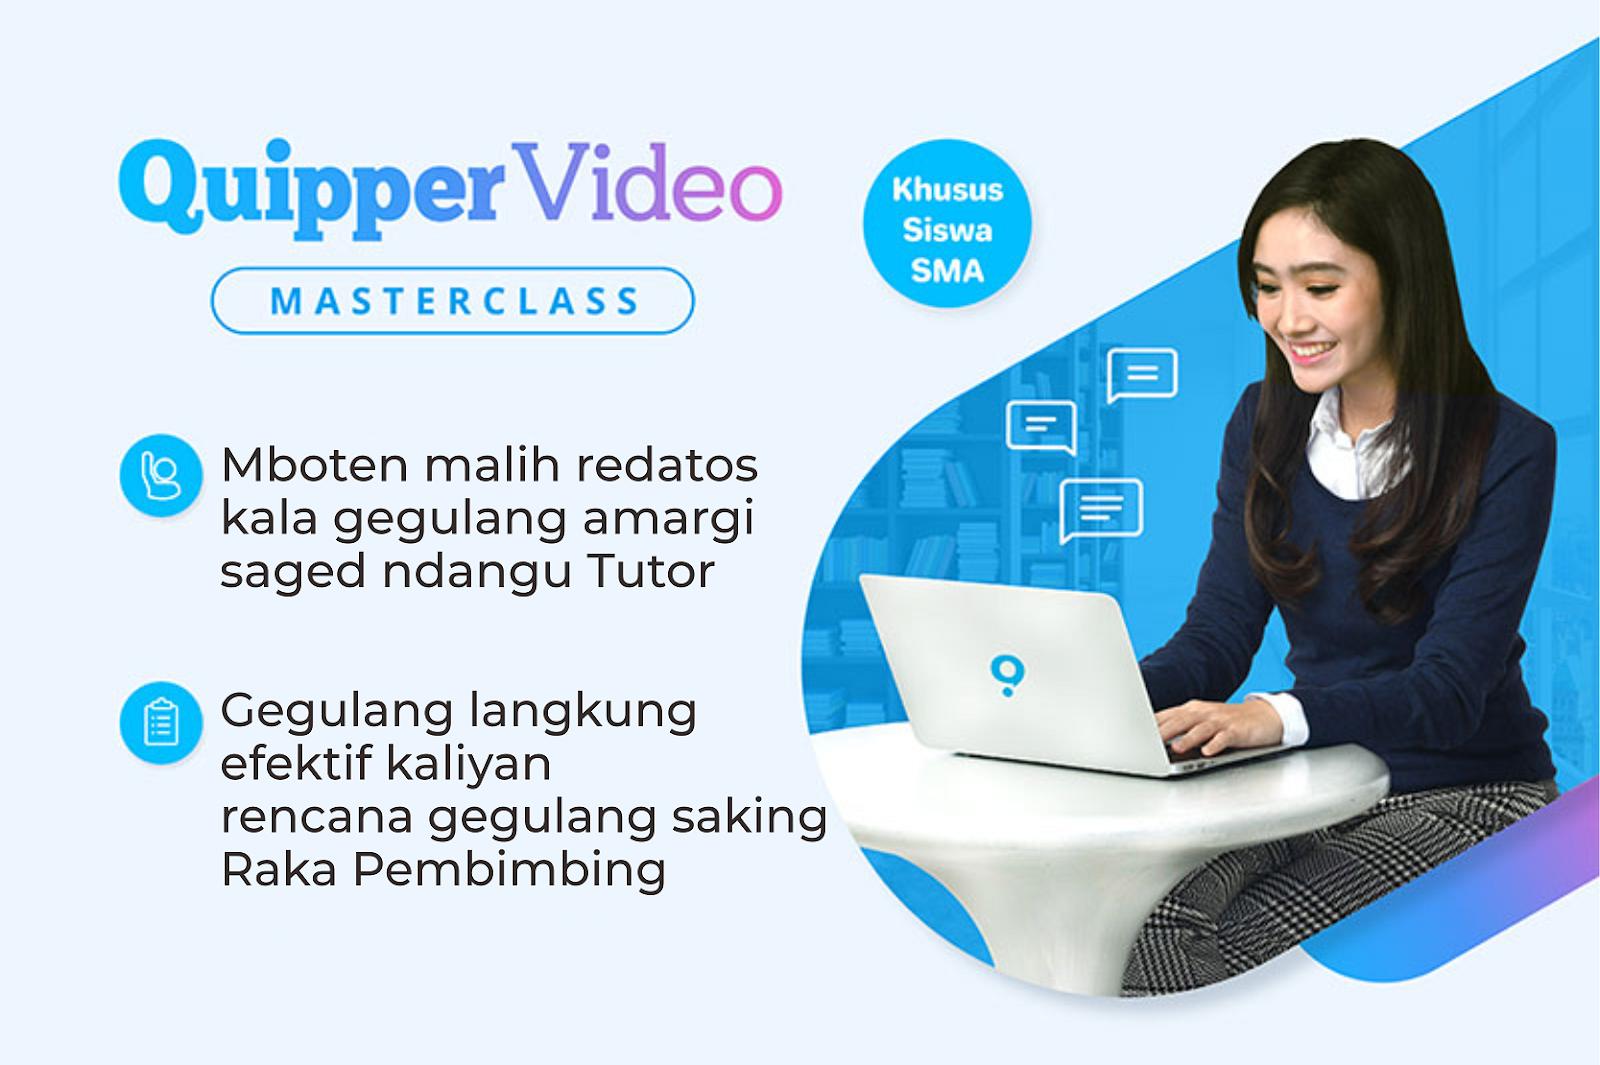 Contoh Iklan Bahasa Jawa Beserta Gambarnya tentang Produk ...